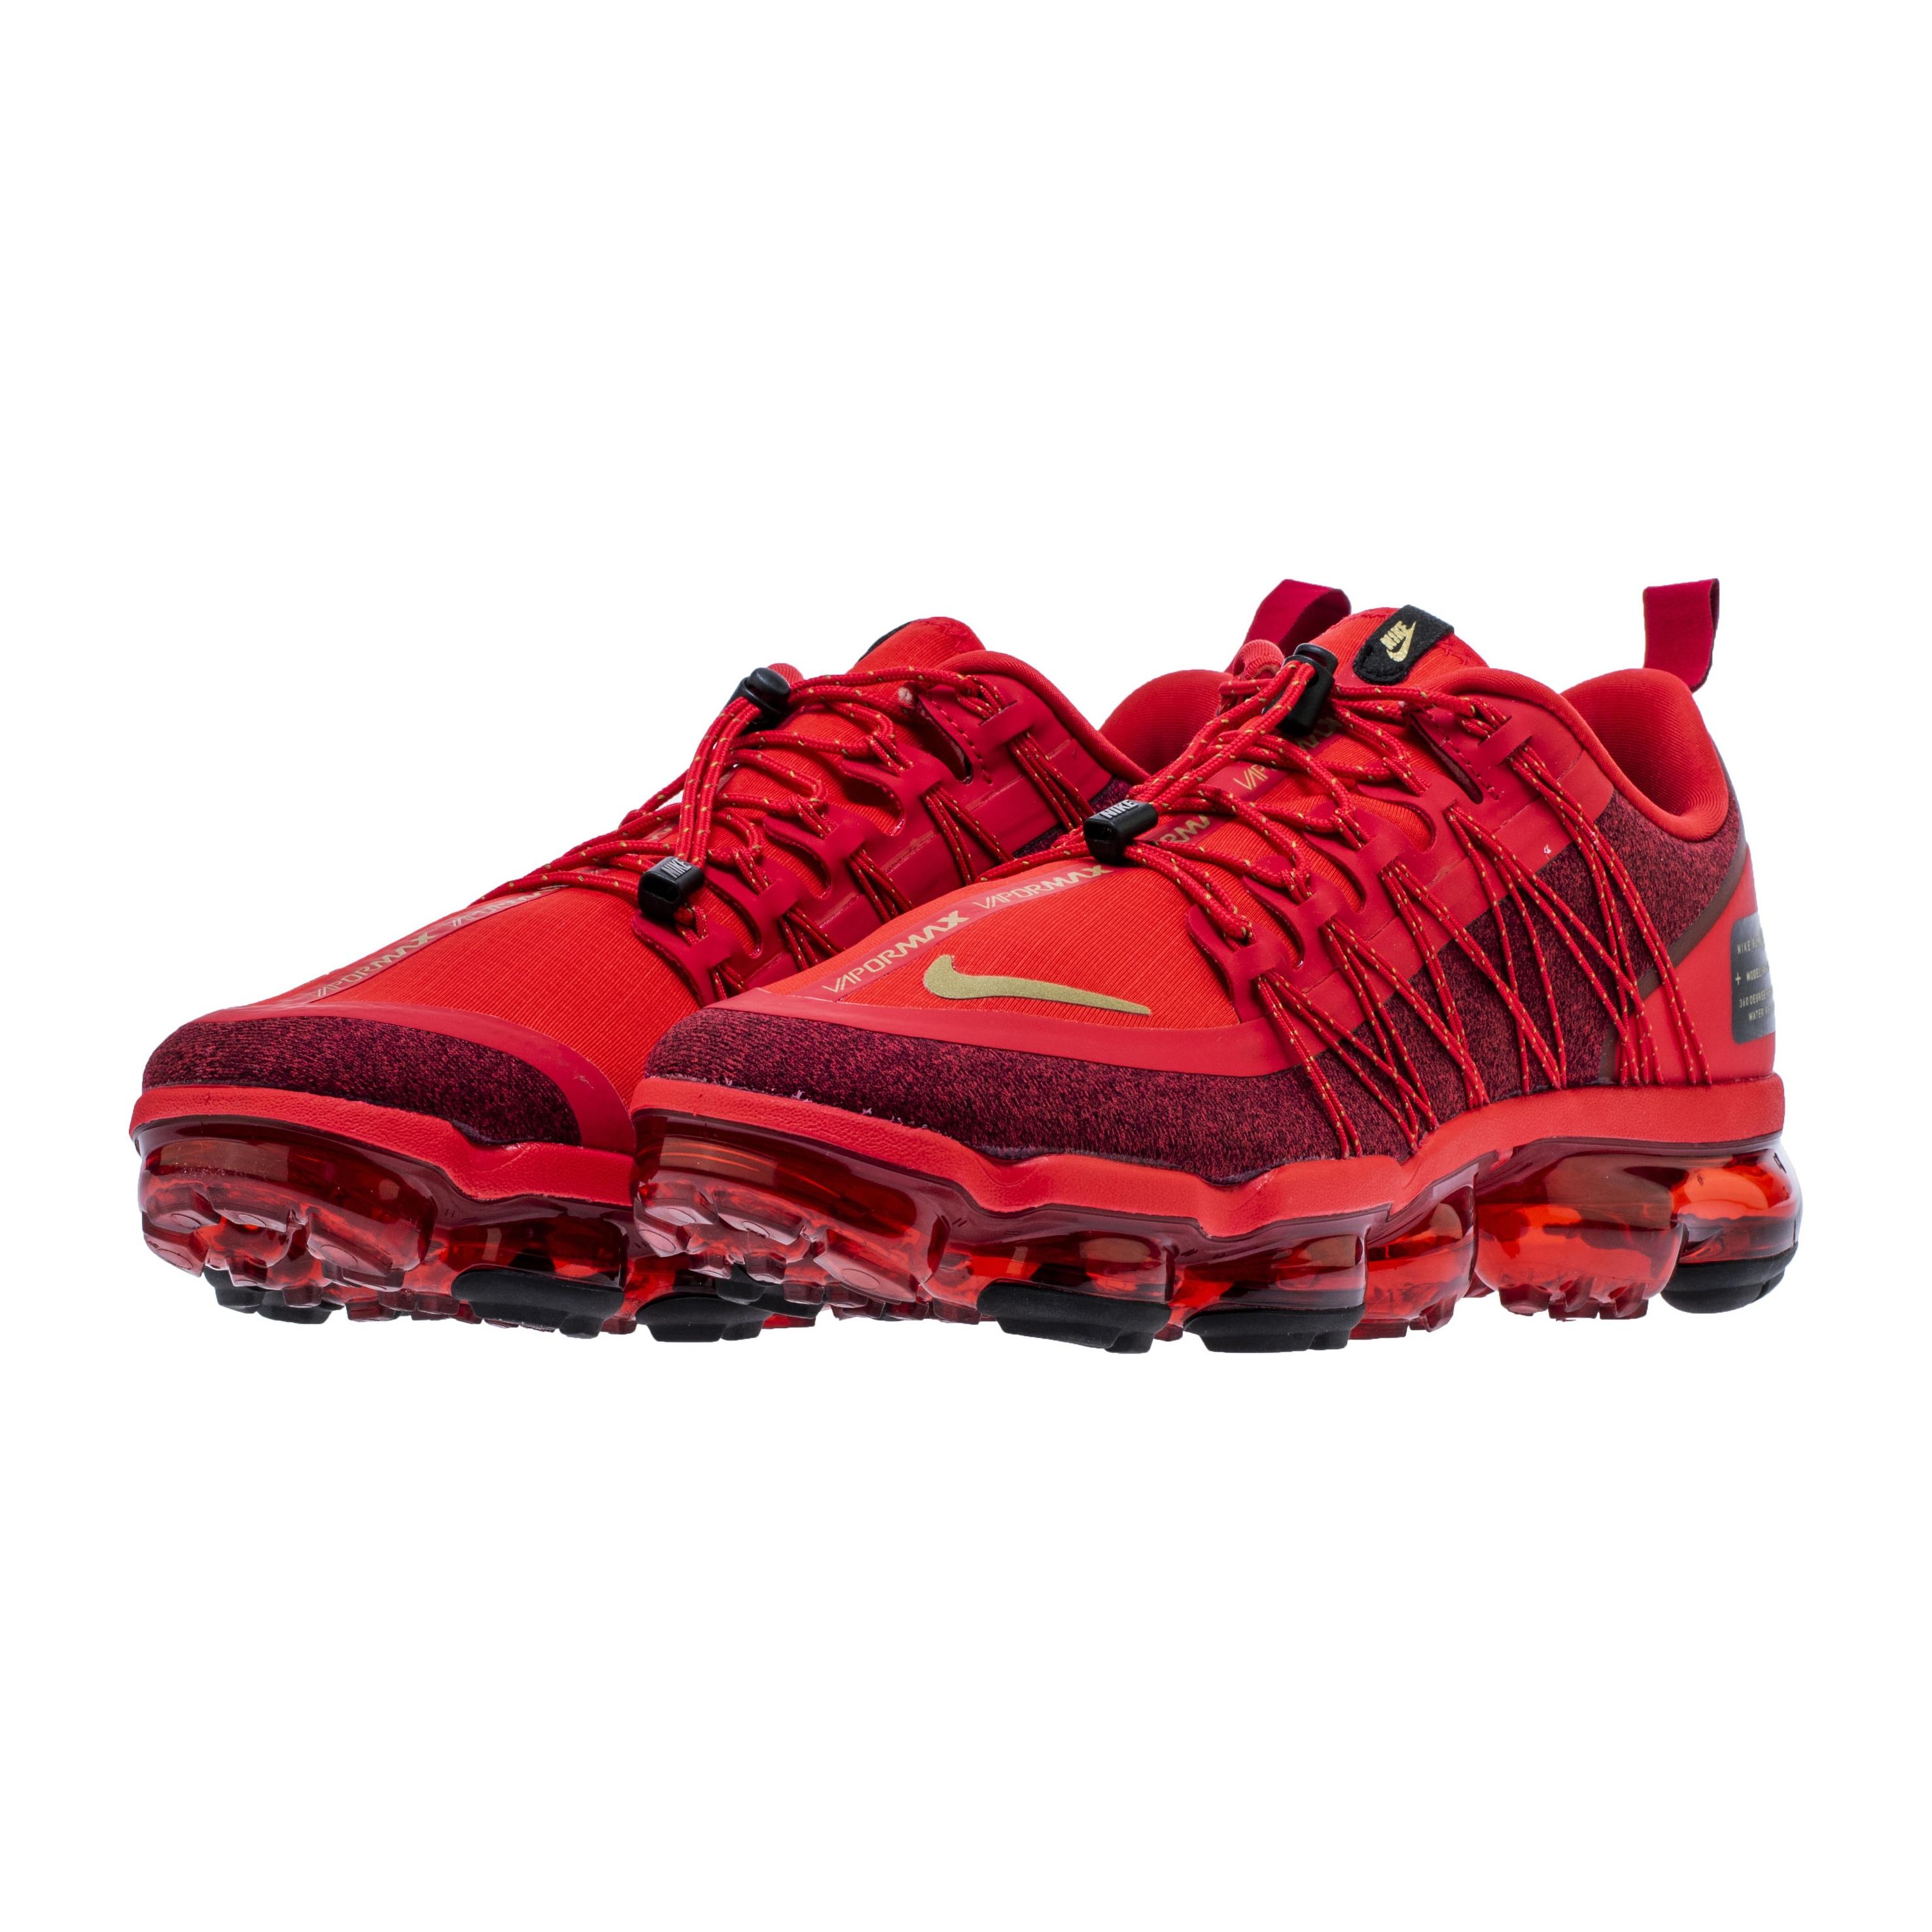 black vapormax red laces